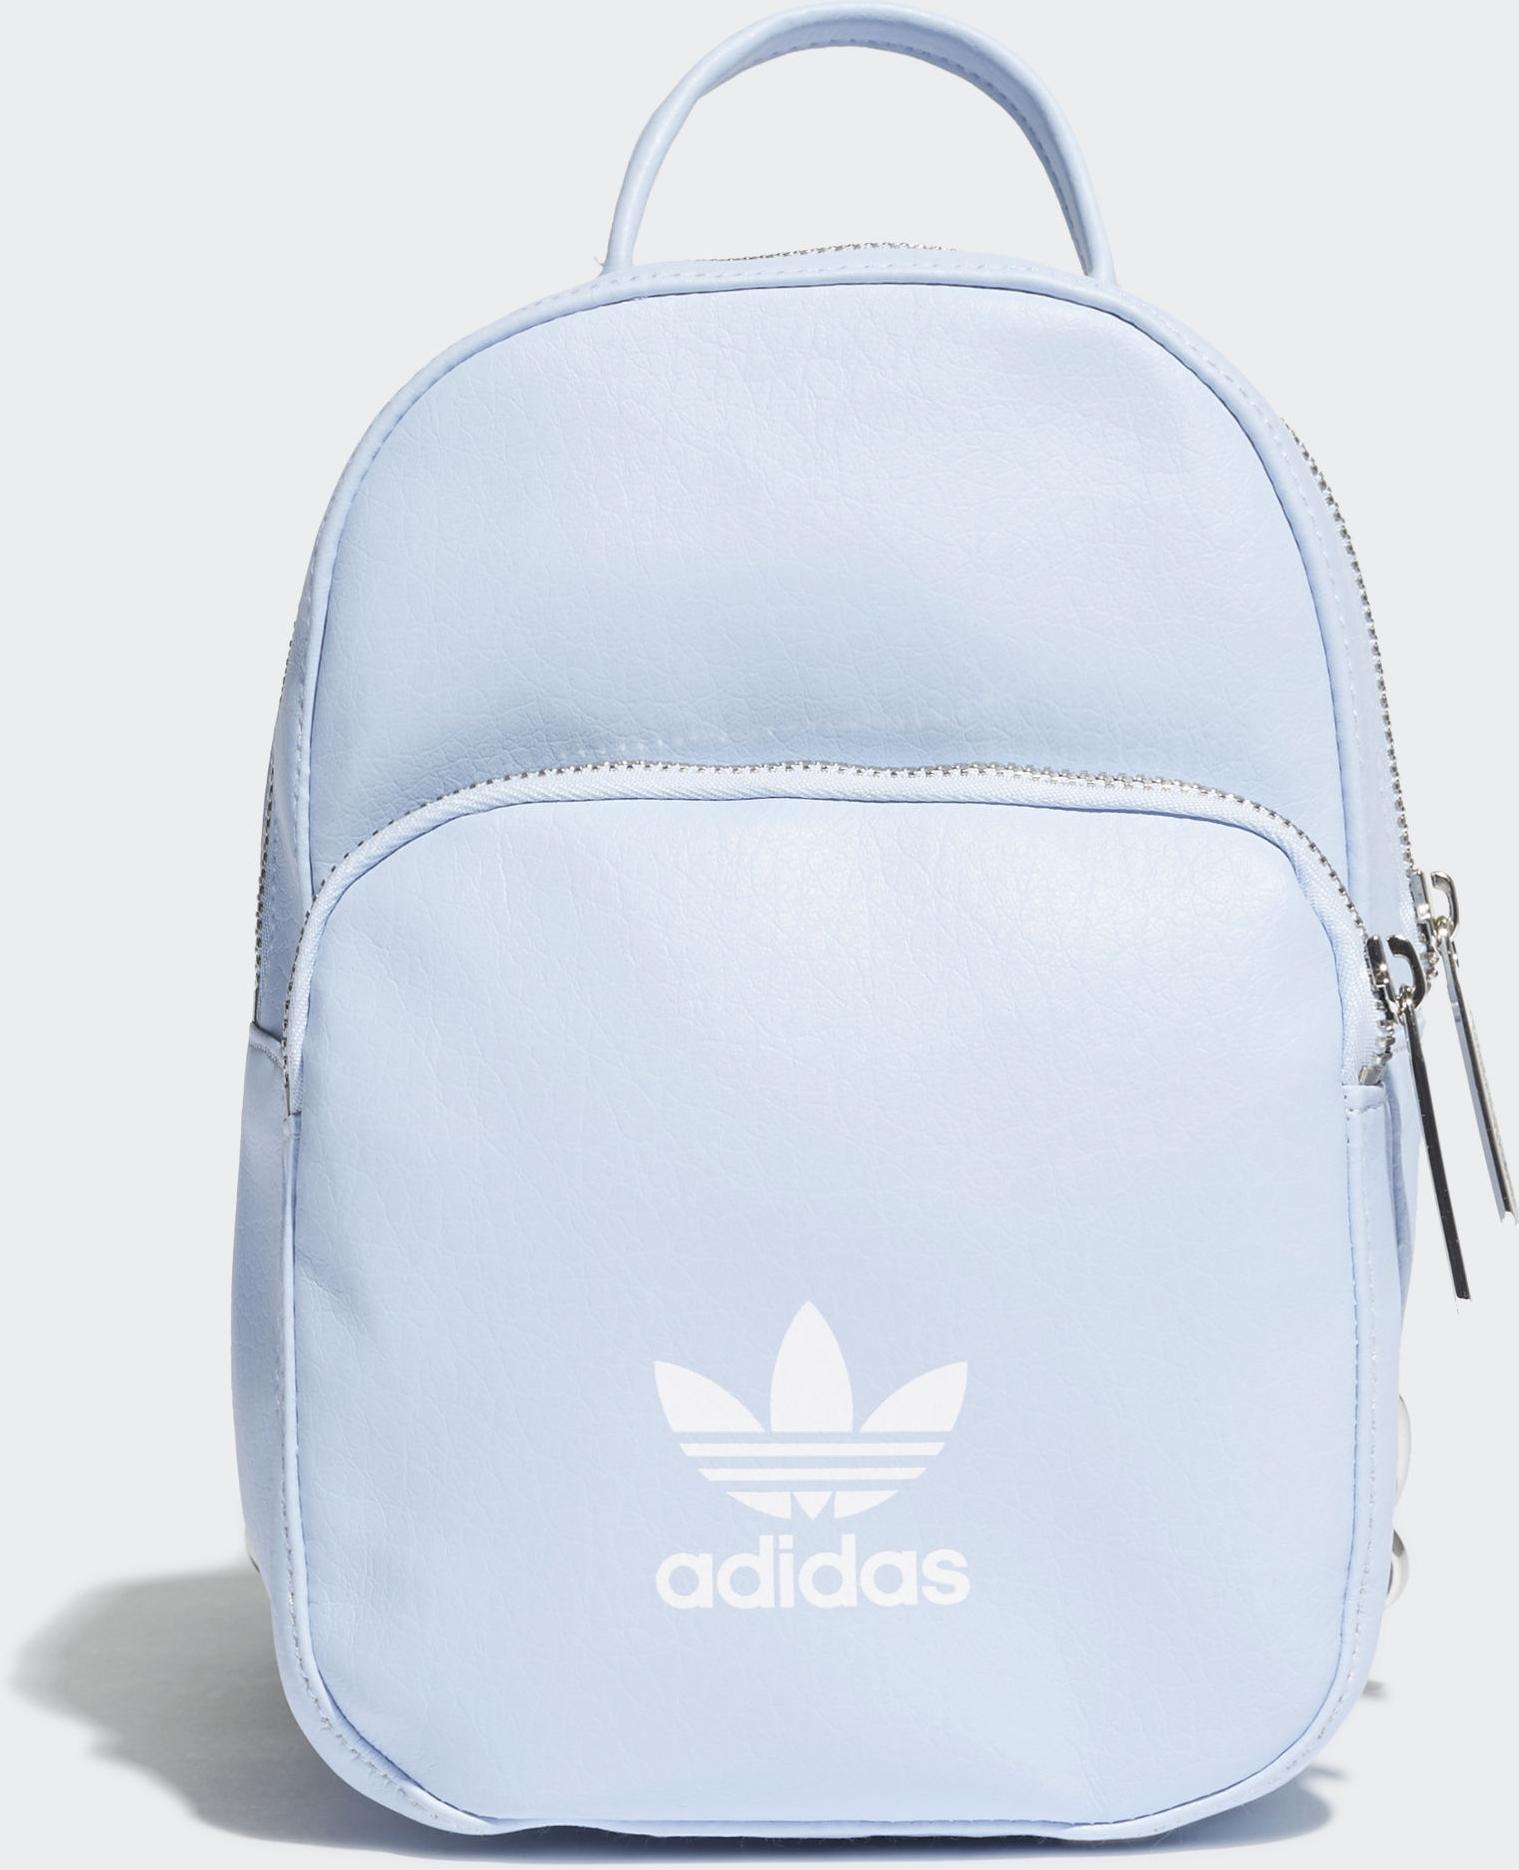 Рюкзак Adidas Bp Cl Xs, цвет: голубой. DU6810 рюкзак adidas real id bp цвет белый cy5618